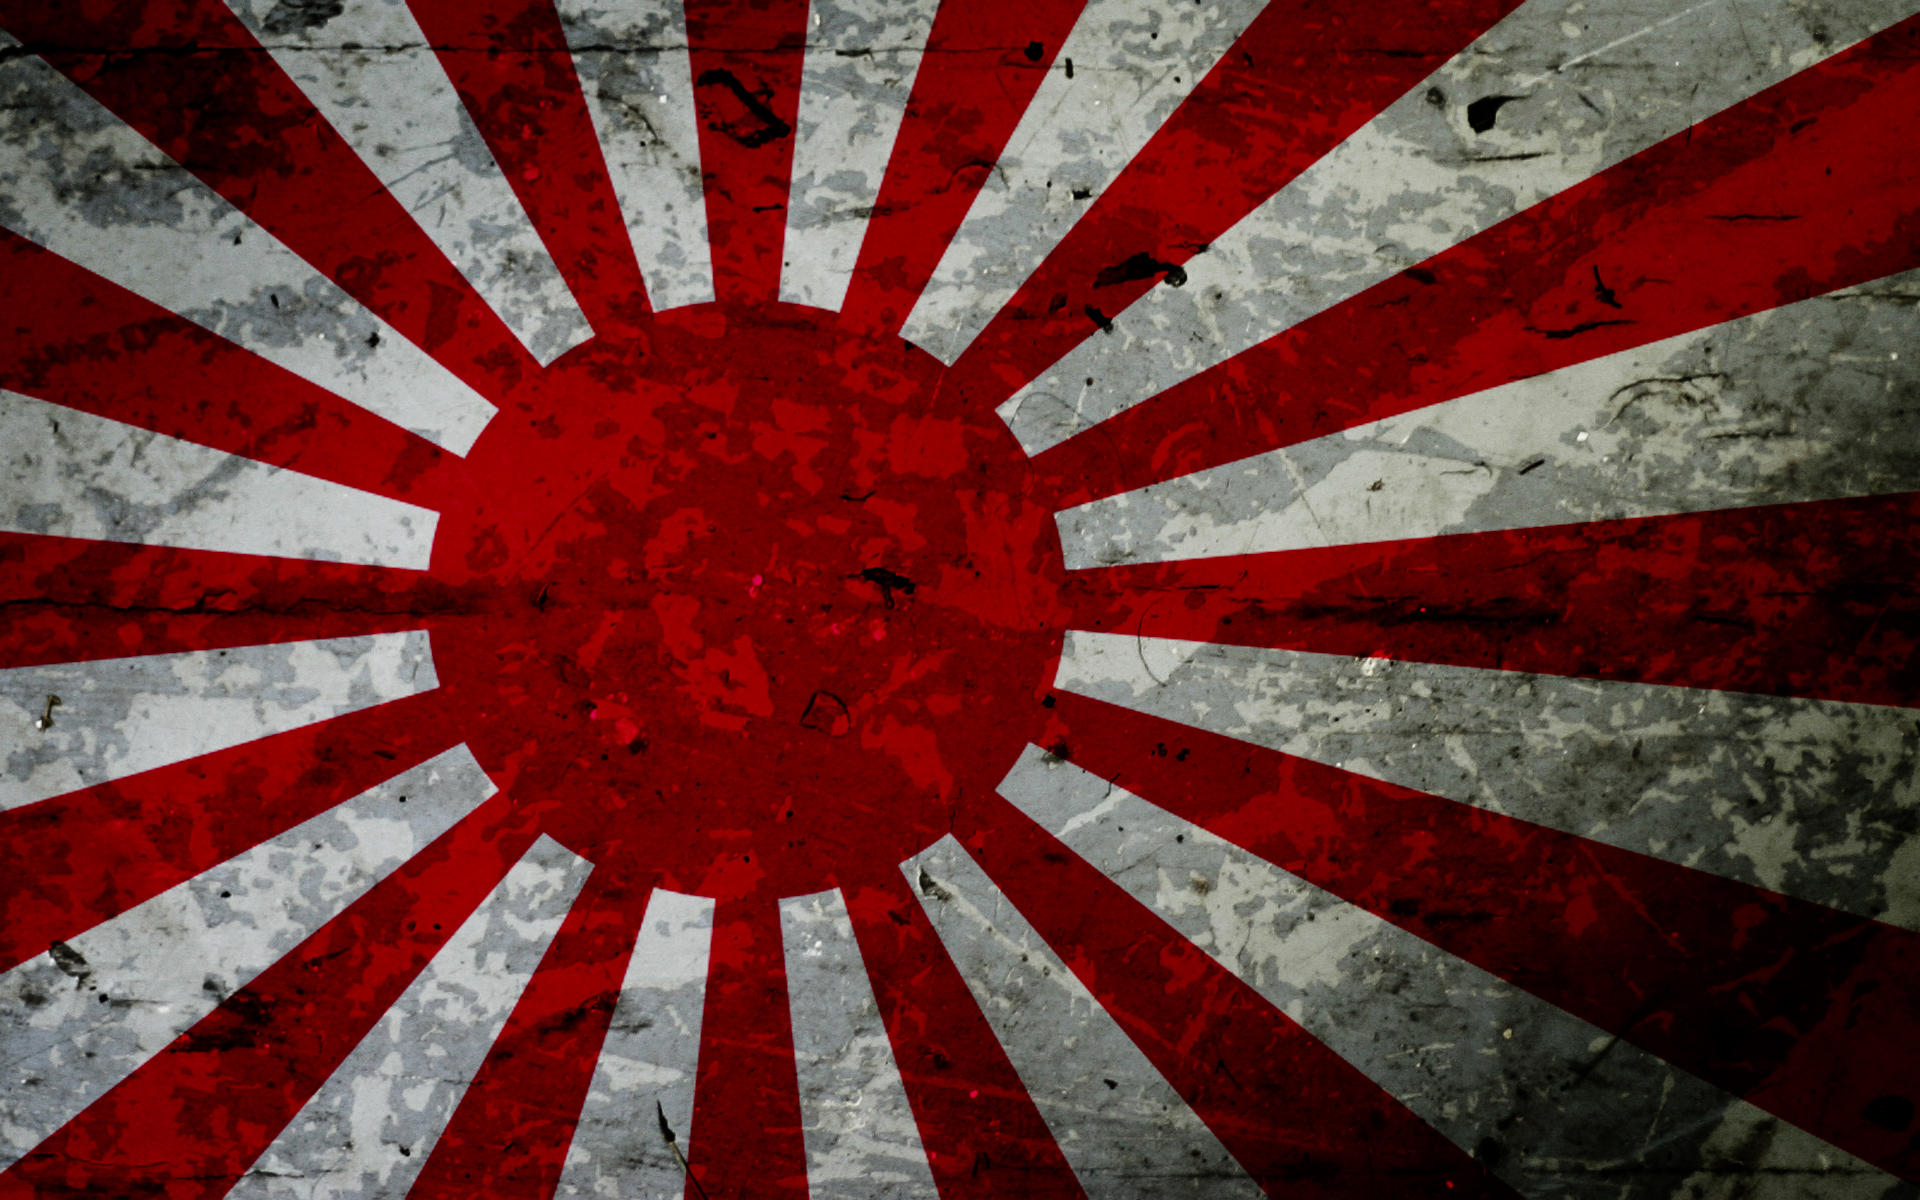 Japan, red, flags, like nazi flag - Free Wallpaper ...